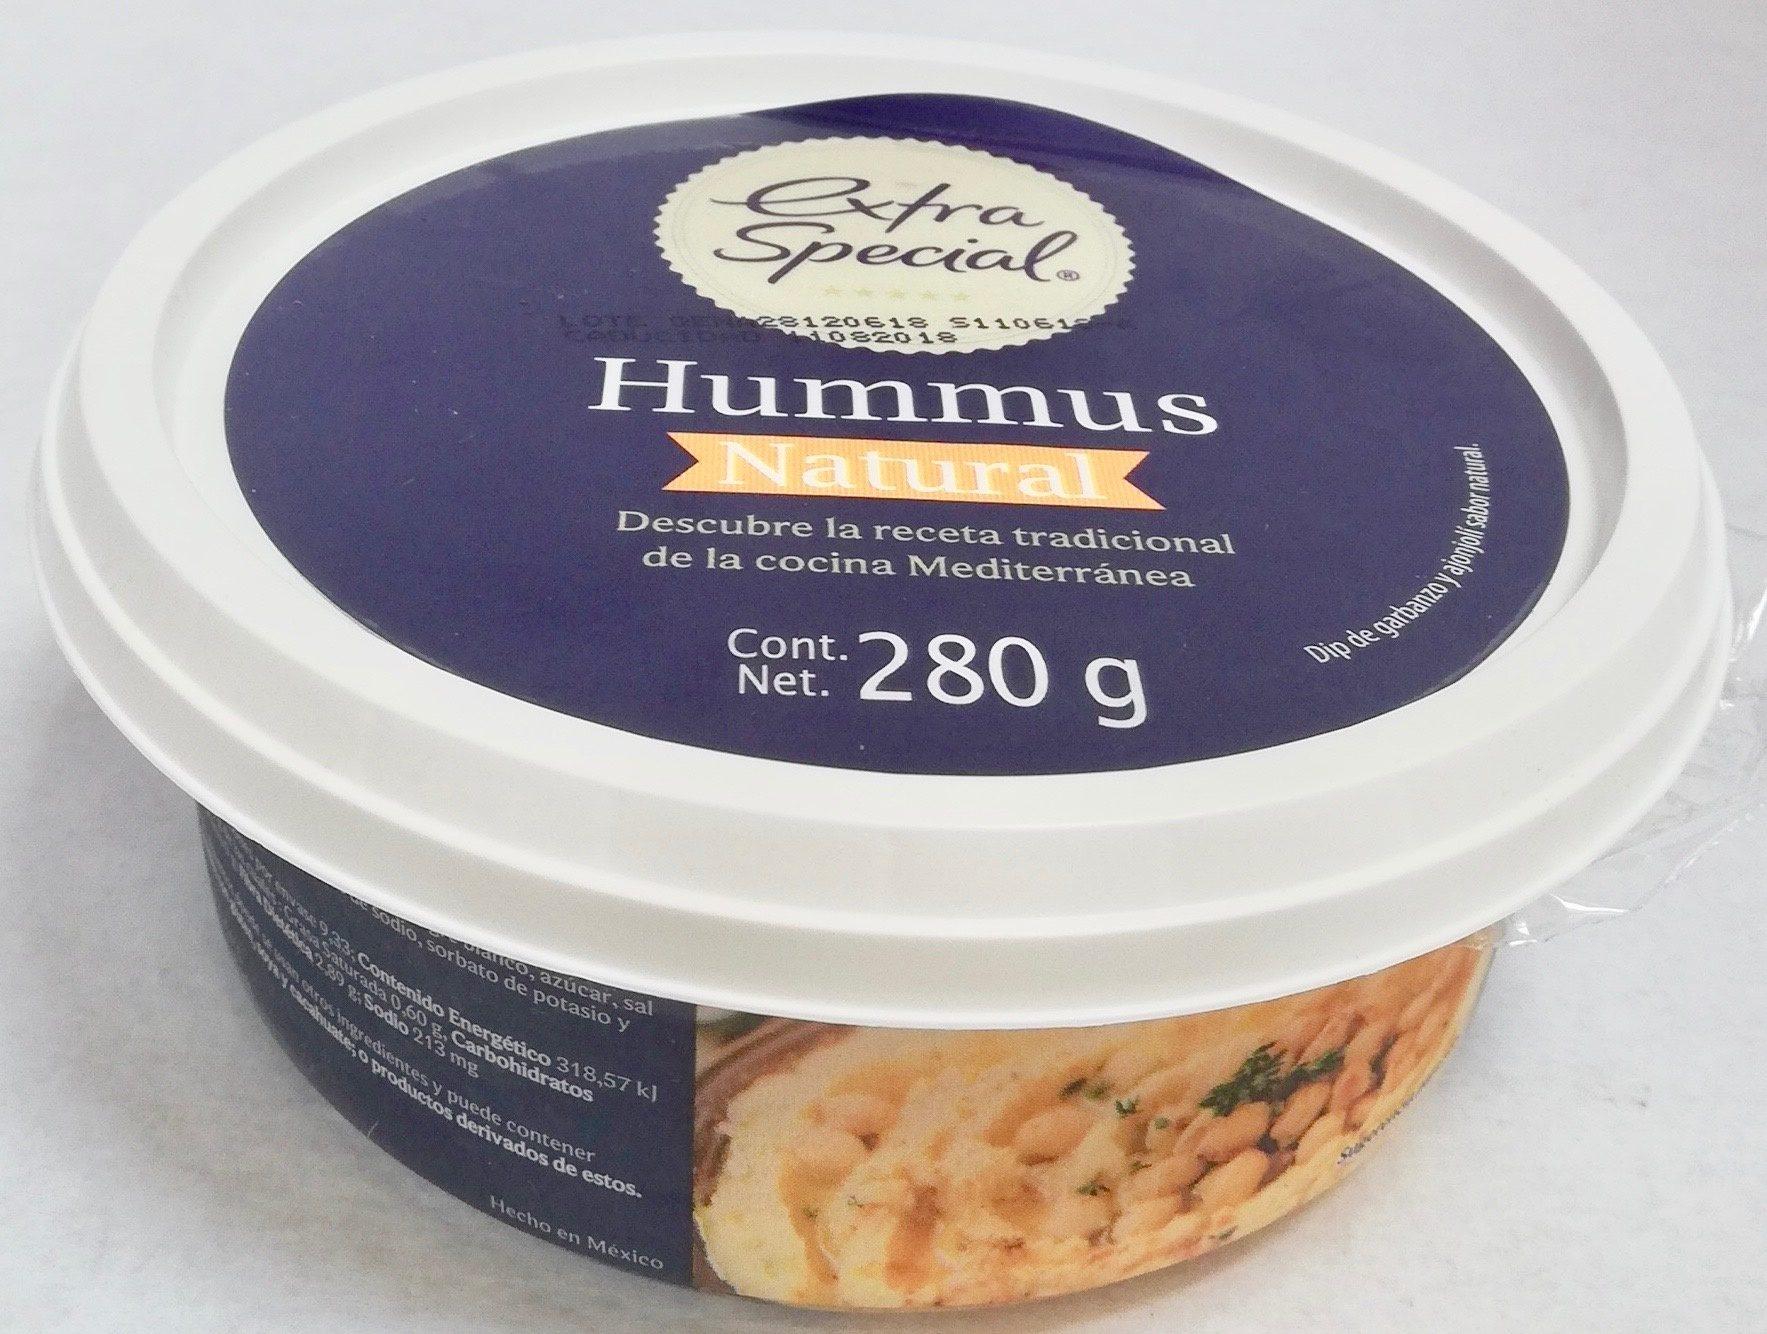 Extra special Hummus Natural - Produit - es